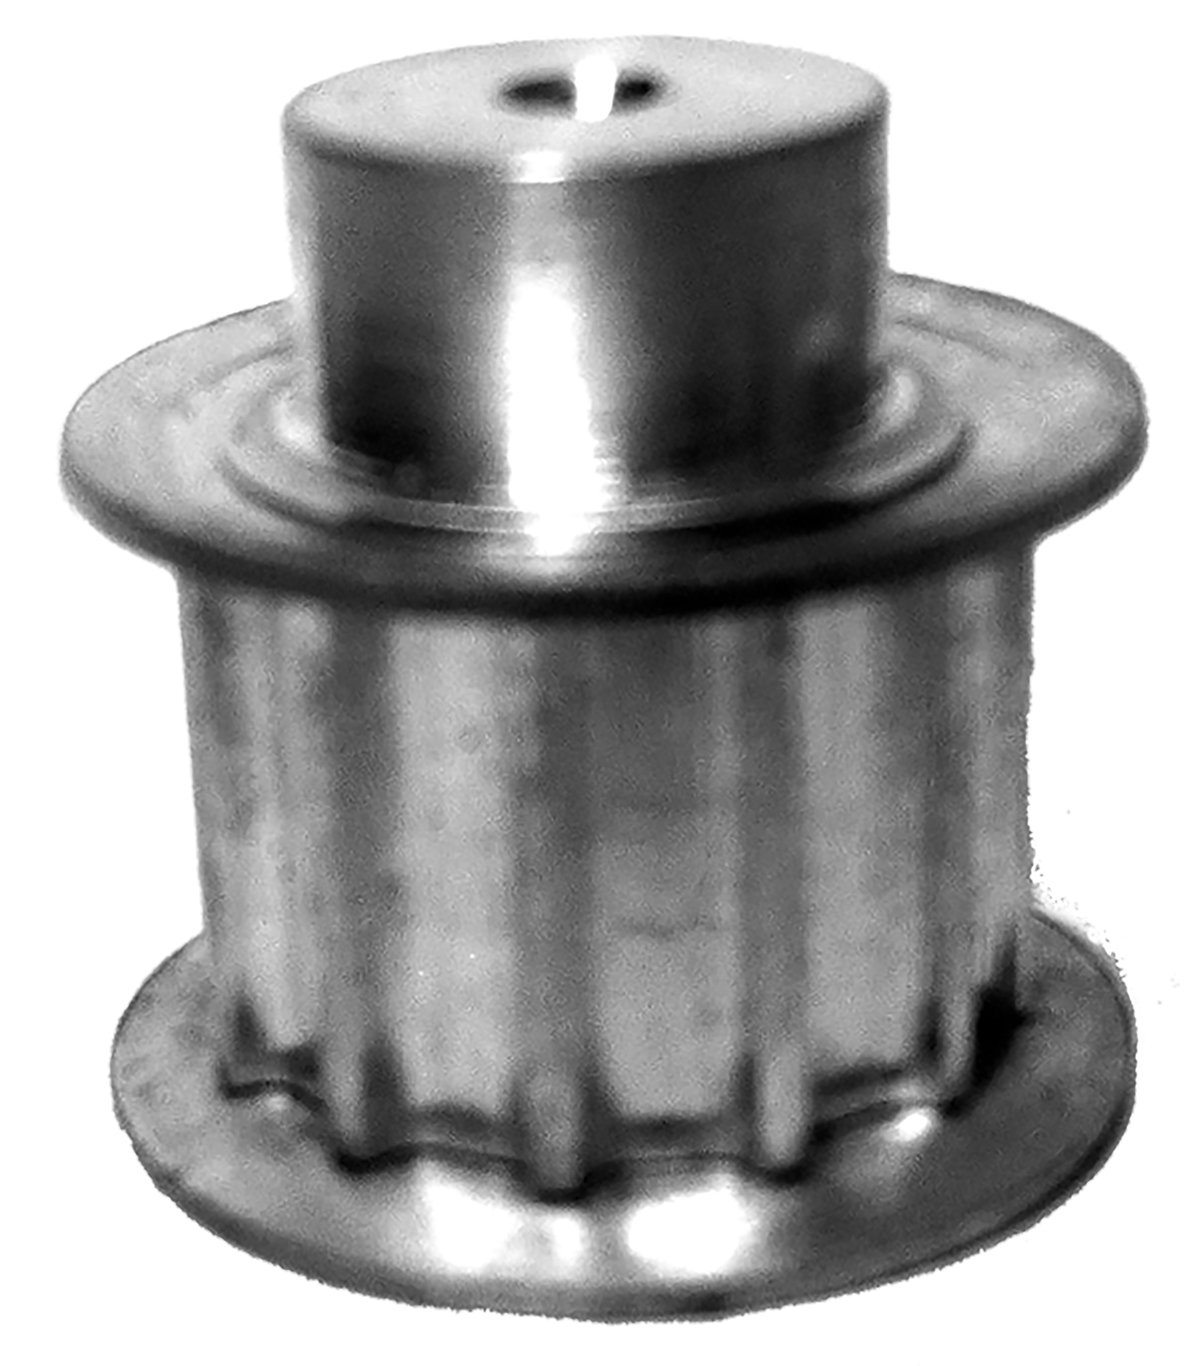 21AT5/12-2 - Aluminum Metric Pulleys